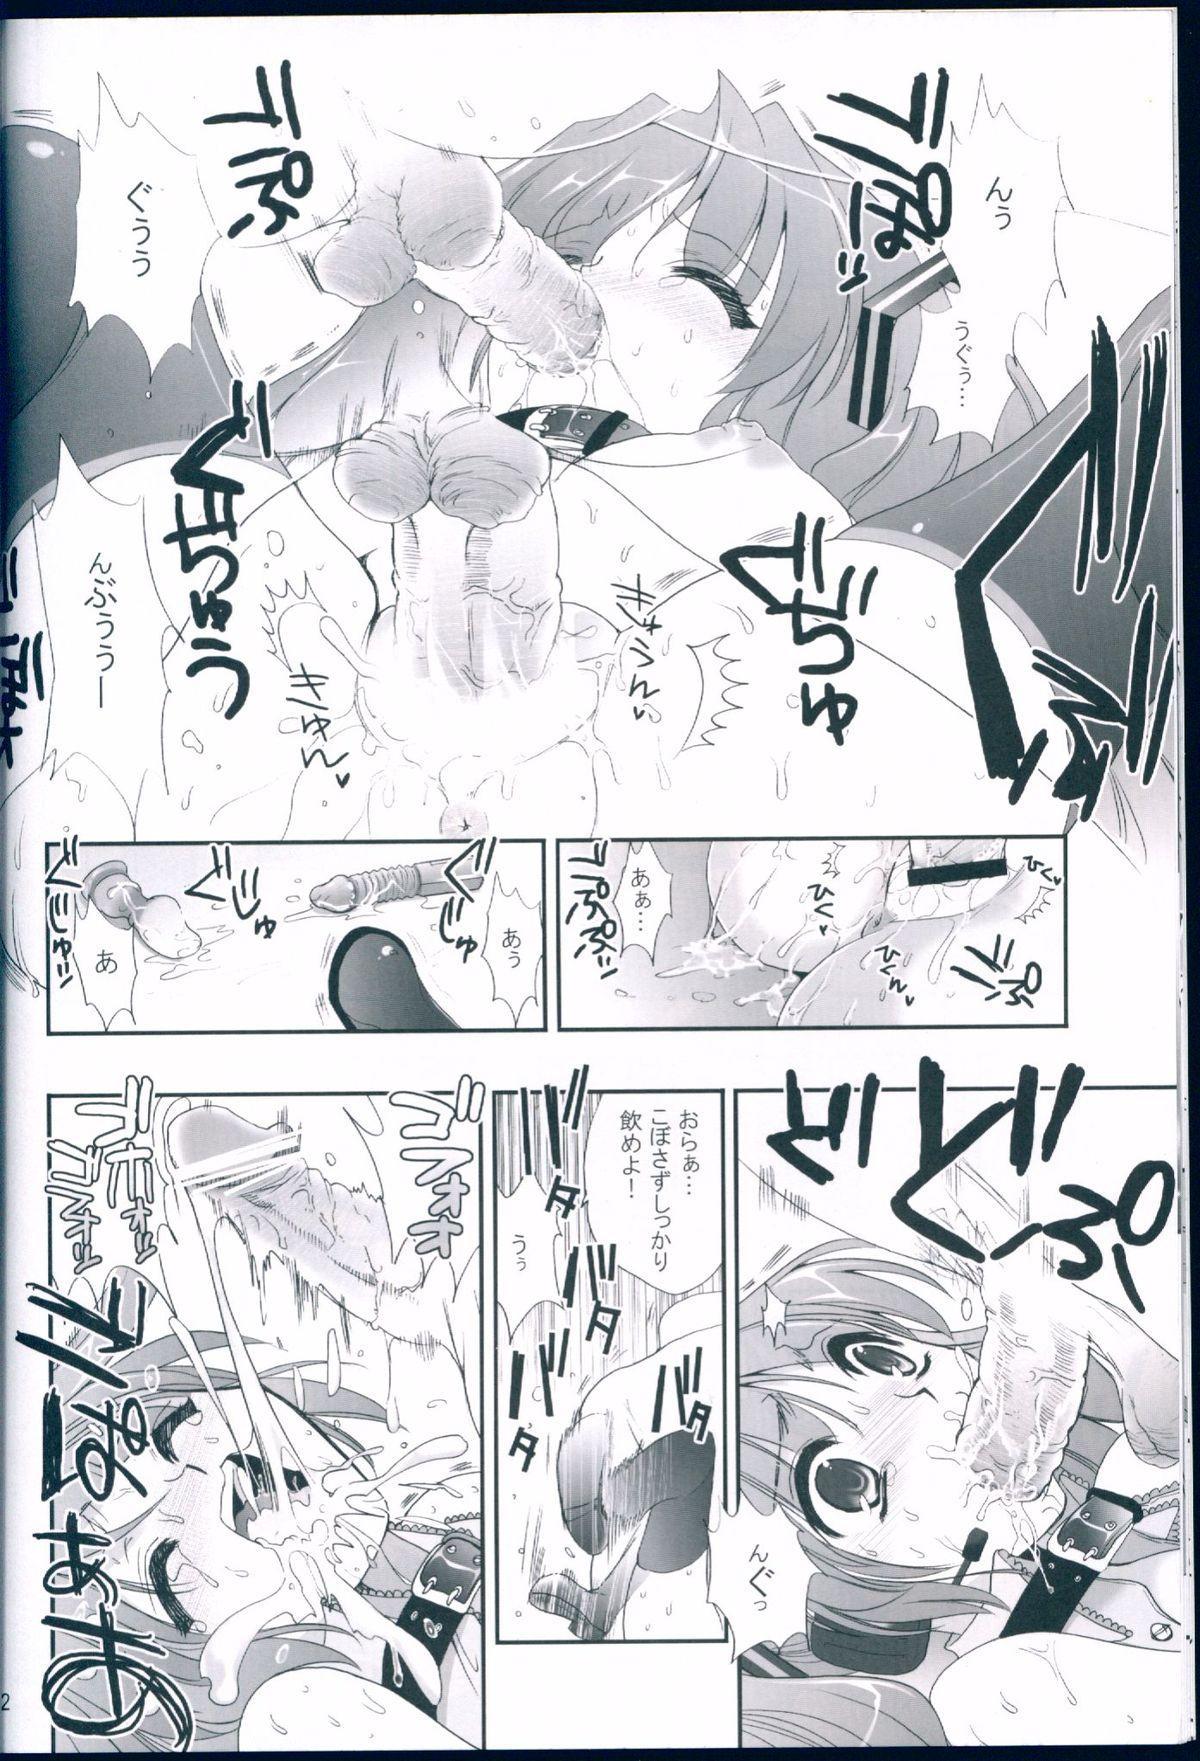 R Juu - Hatsune Miku Kenkan 9